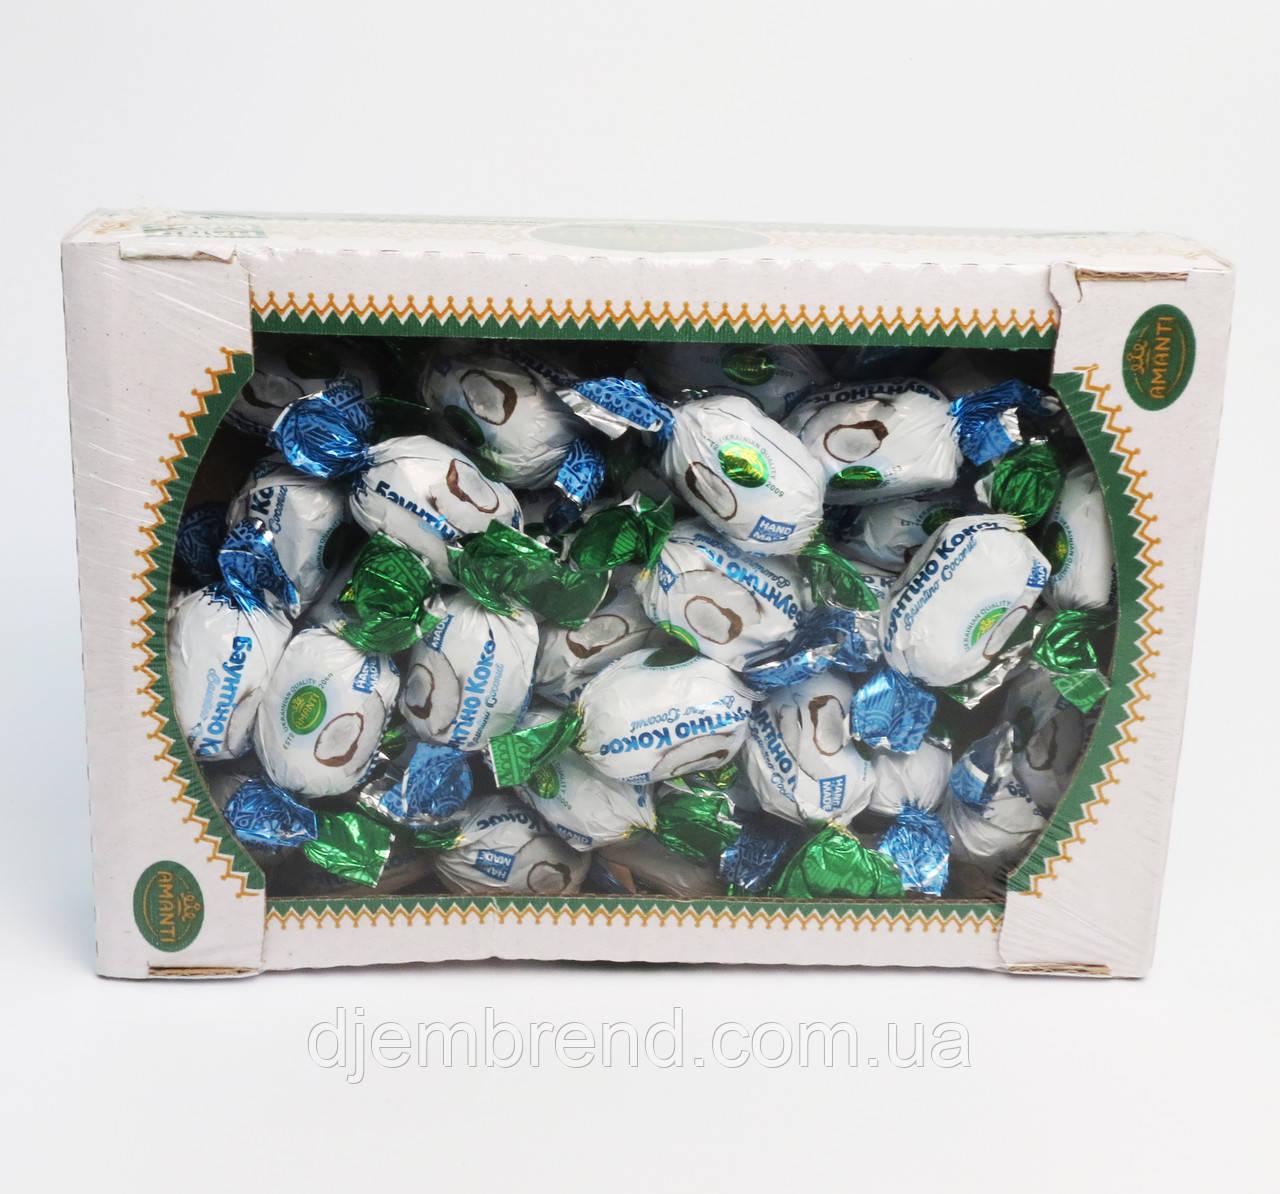 "Конфеты ""Баунти кокос"", Amanti, Украина, 1 кг."